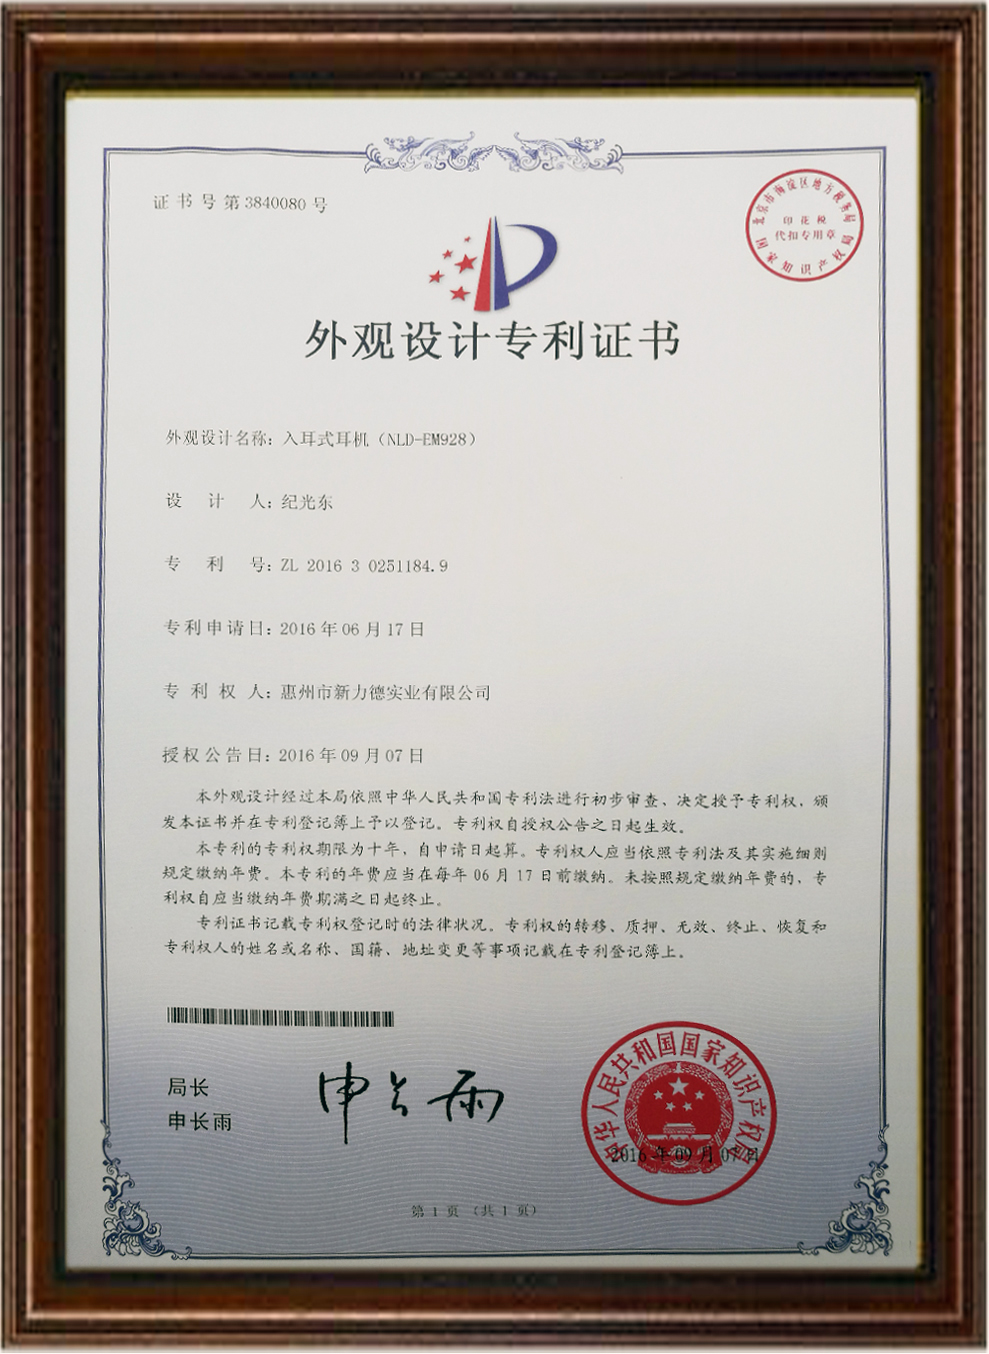 NLD-EM928专利ok 专利号:ZL2016302511849